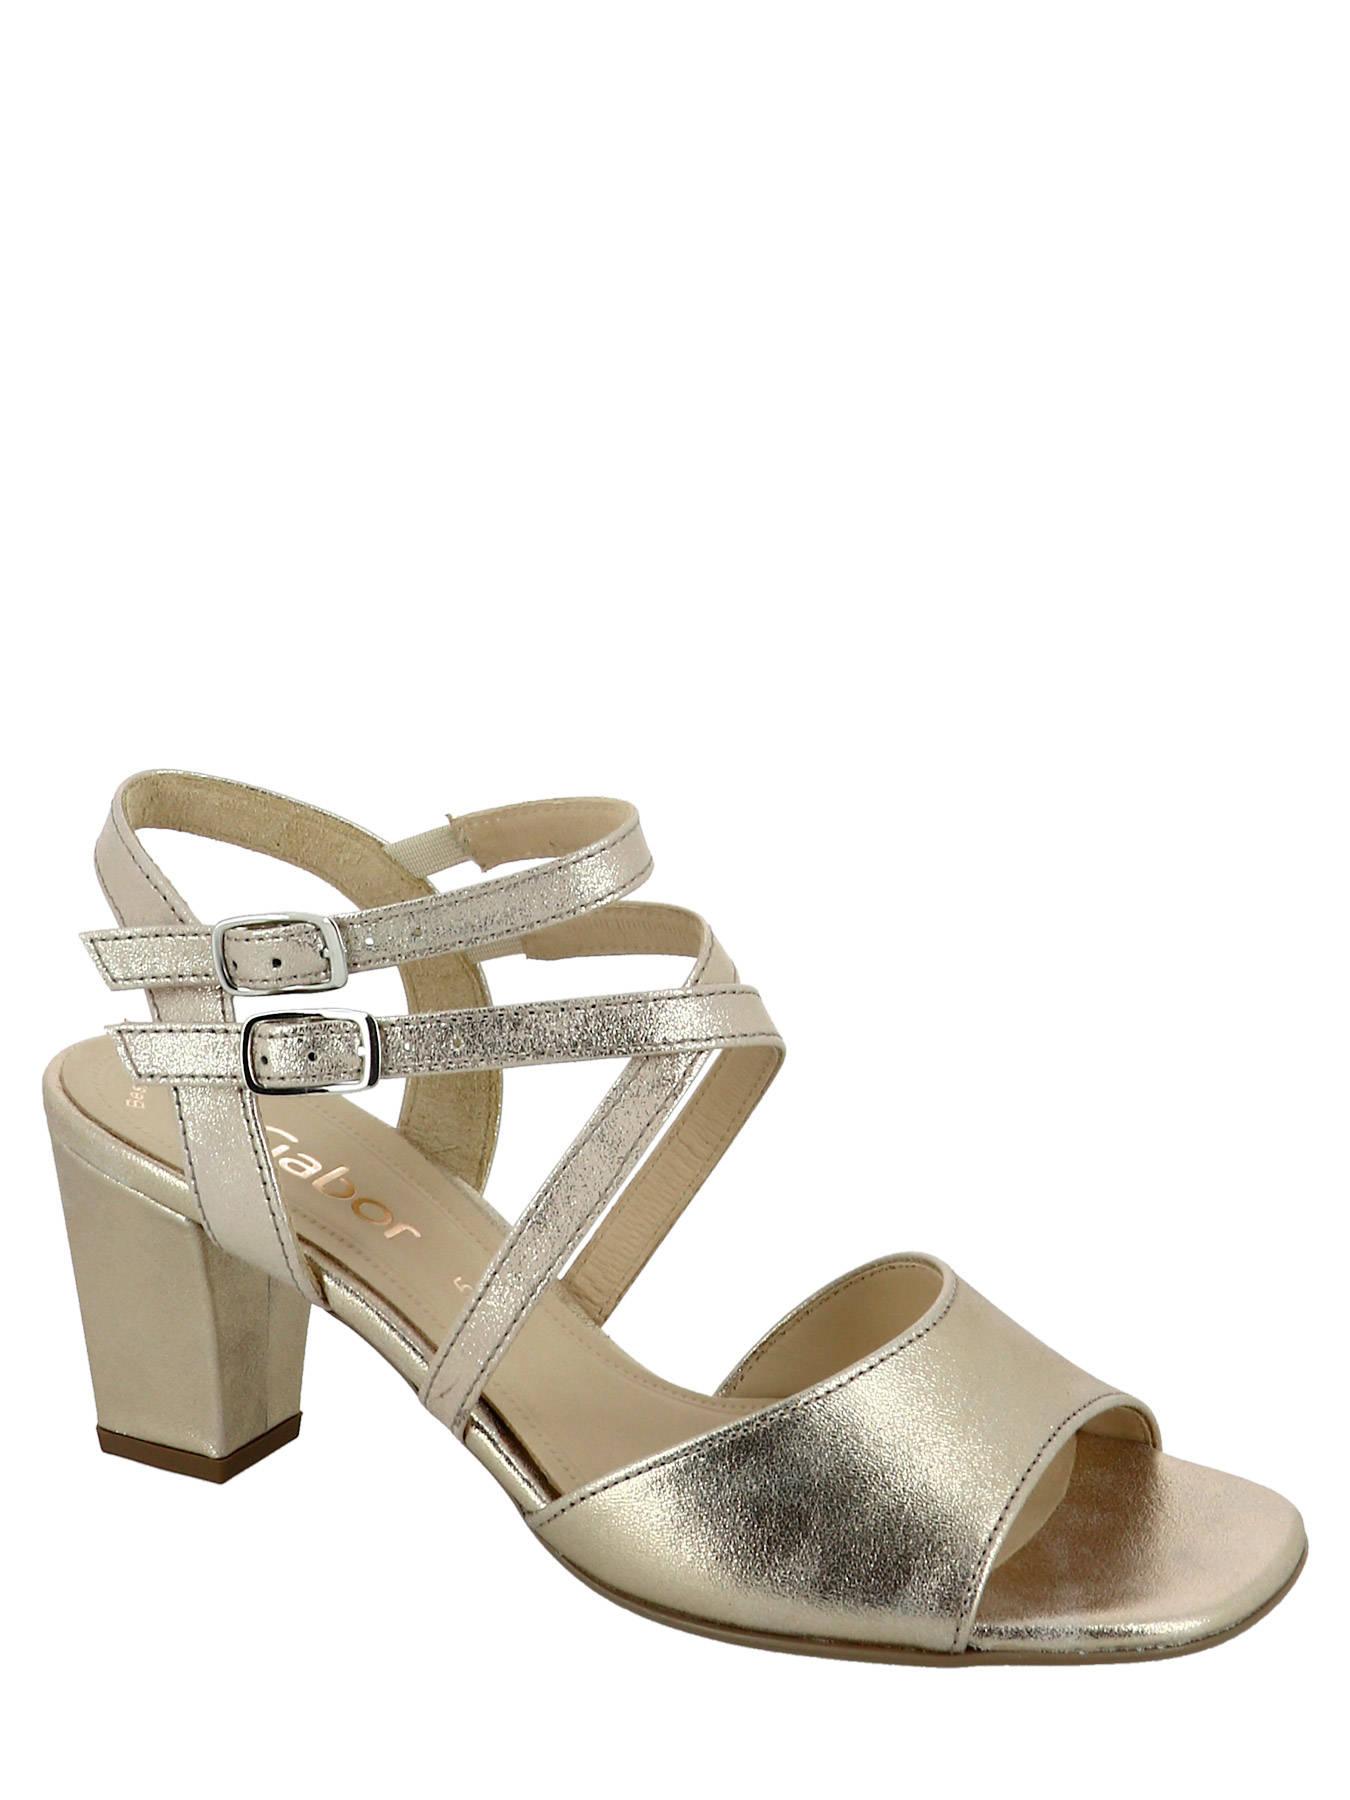 c0797f487b04 Gabor Sandals flip-flops 21850 - best prices